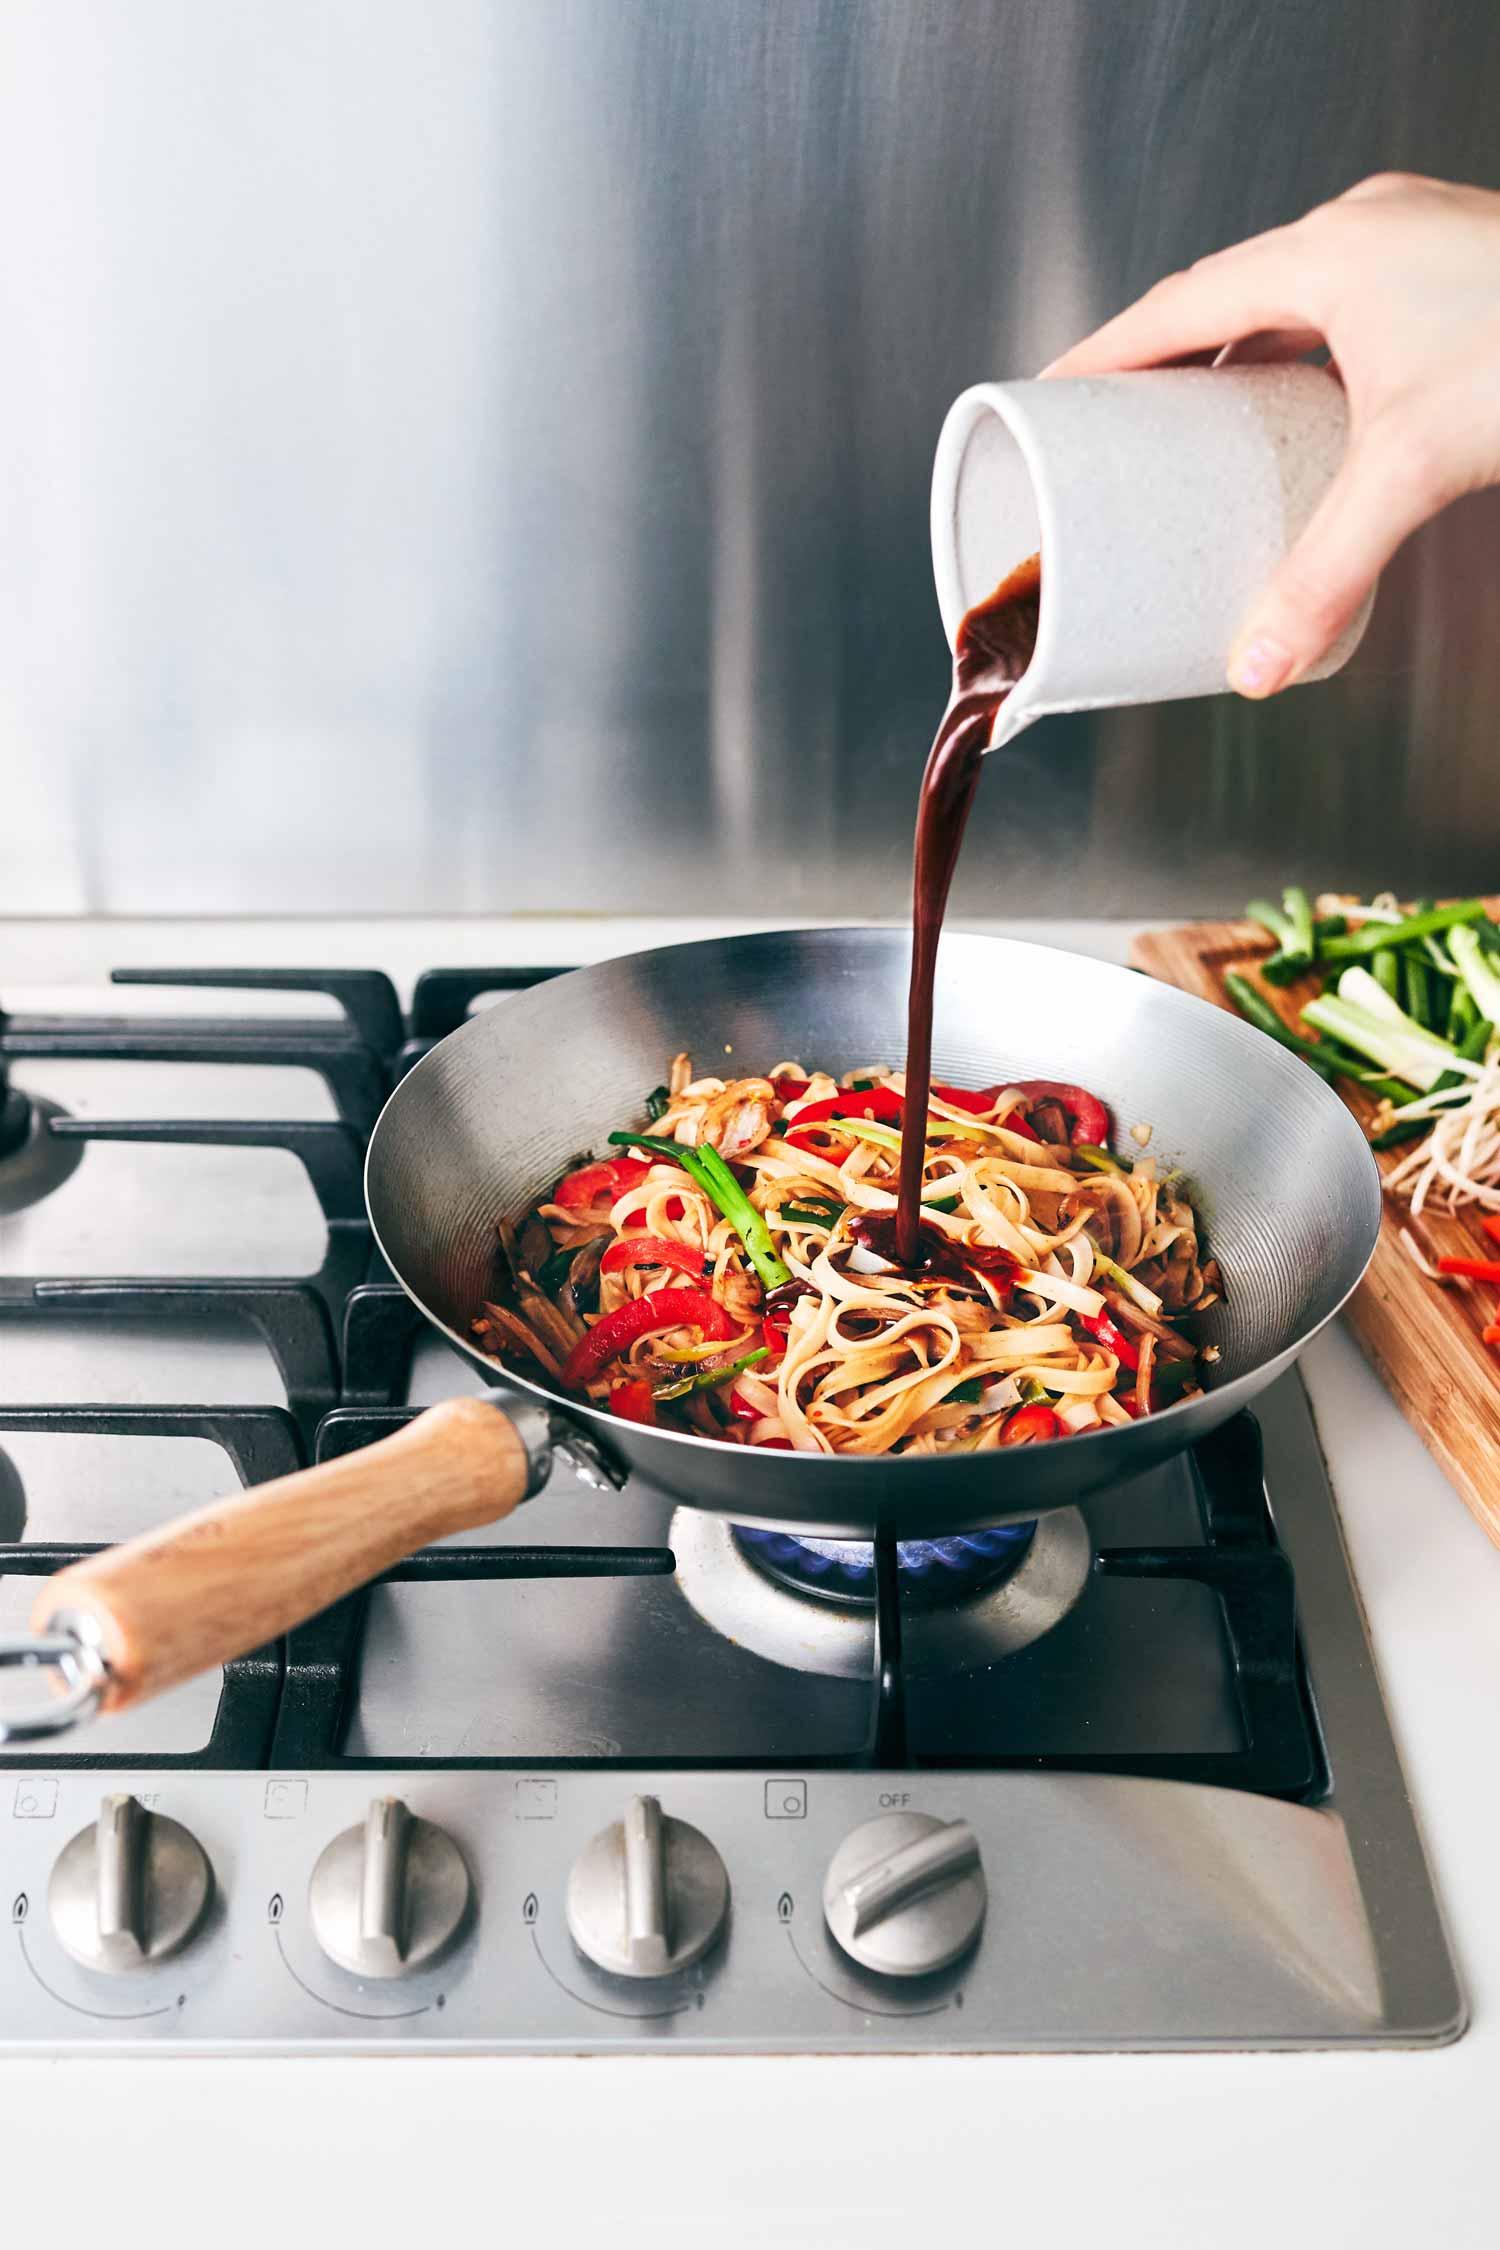 4-Ingredient Vegan Pad Thai Sauce | Evergreen Kitchen | Vegan & Gluten Free